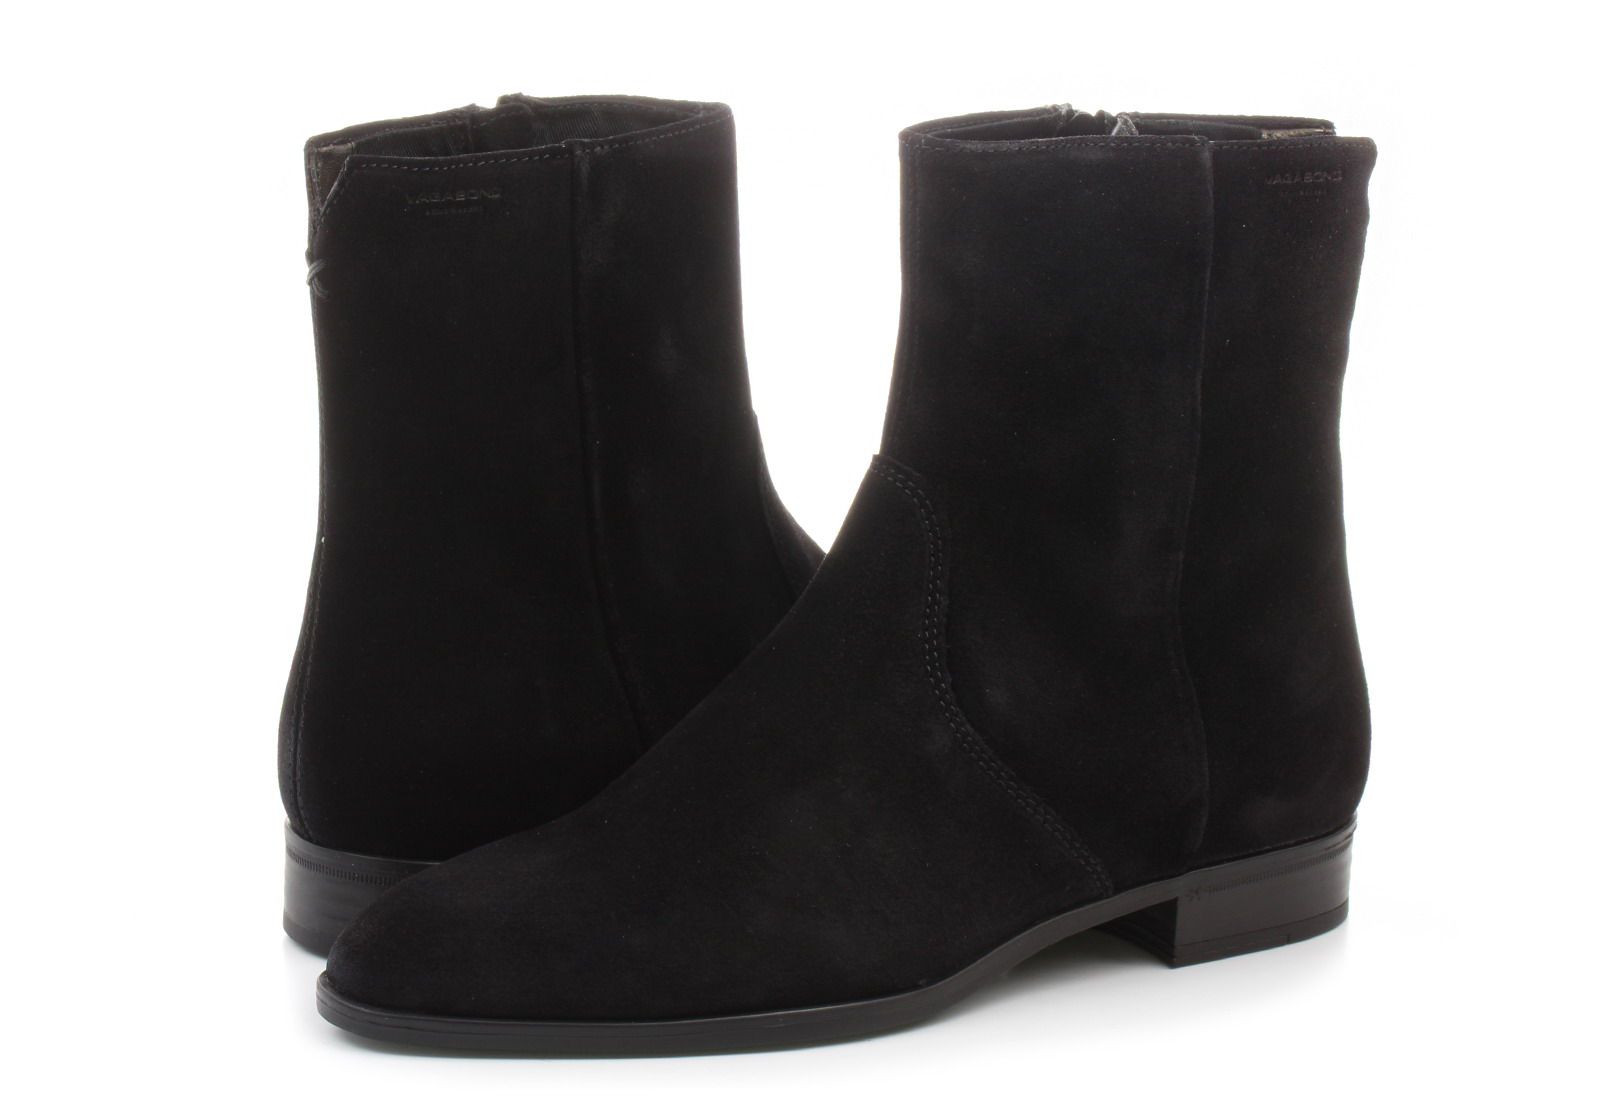 Vagabond Csizma - Frances Sister - 4607-140-20 - Office Shoes ... c60da19ab7